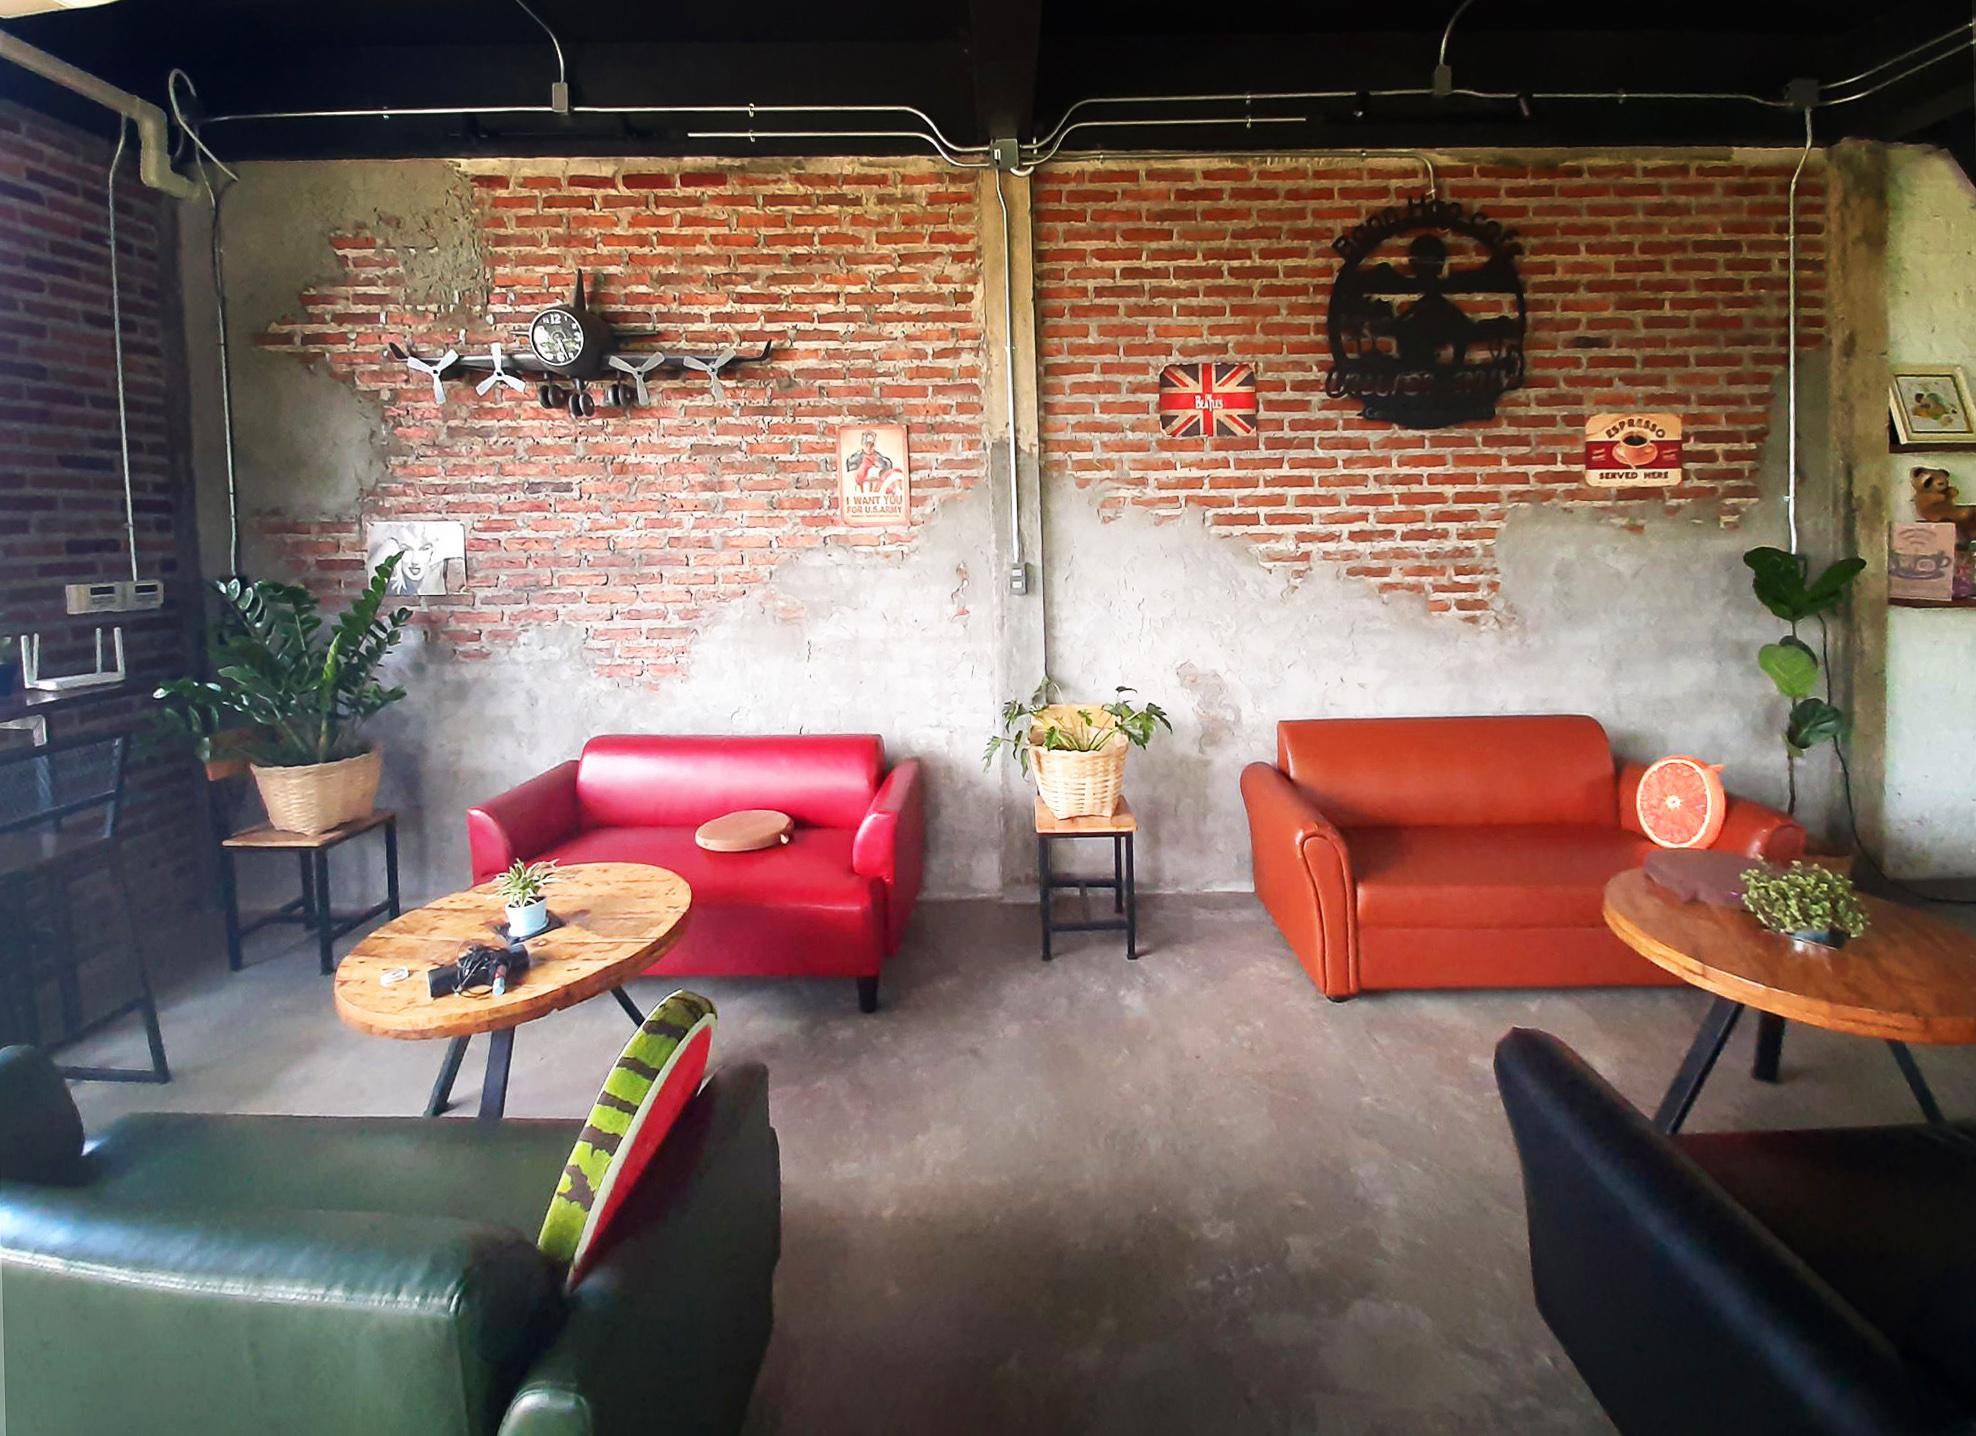 Bann Hao cafe' | Cafe – Bar – Bistro |  Khao Suan Kwang | Khon Kaen – Udon Thani | Thailand